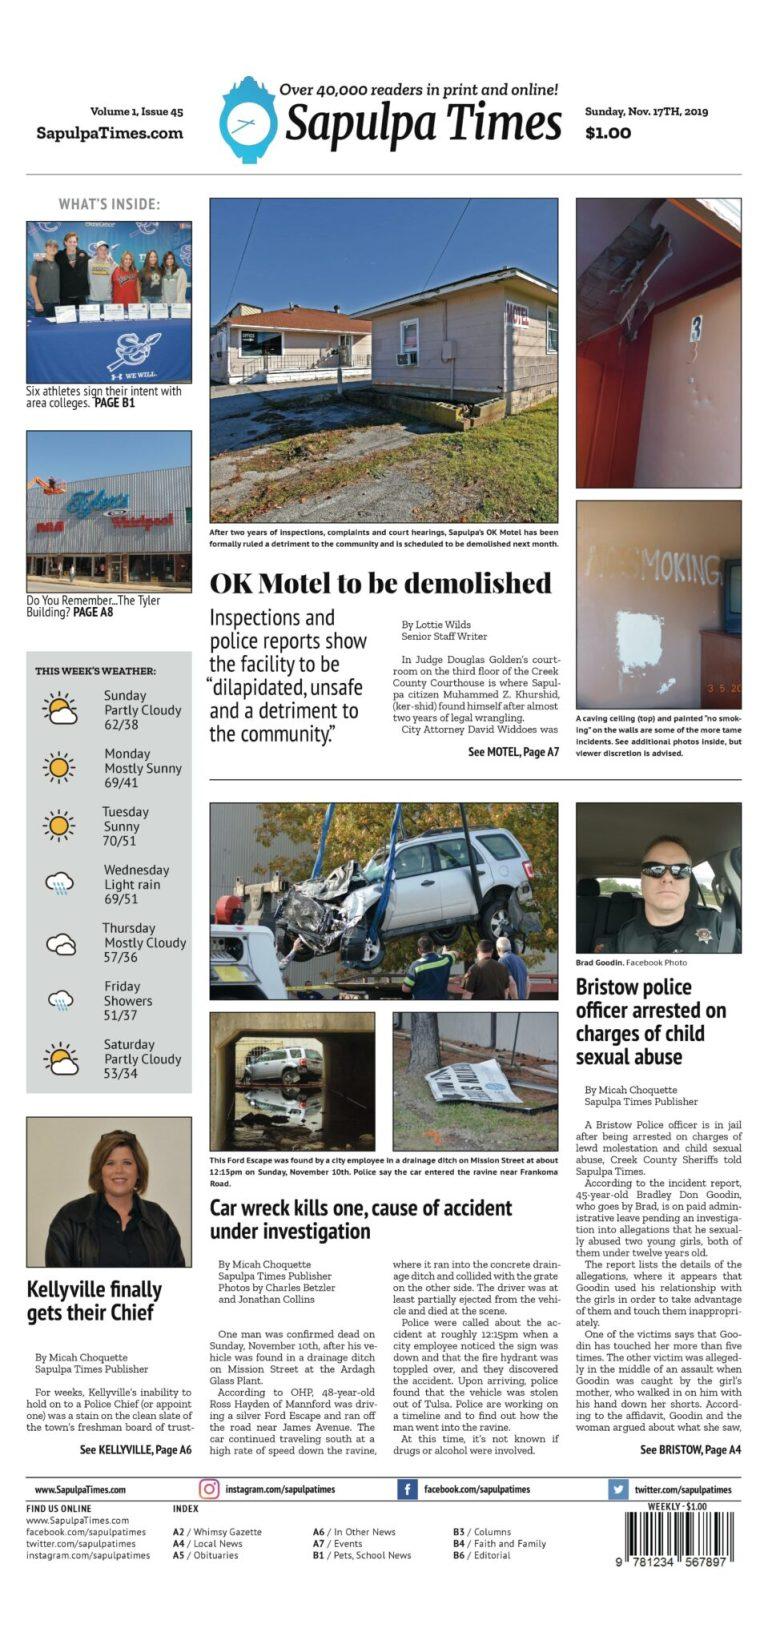 Sapulpa Times Digital Edition 11/17/2019